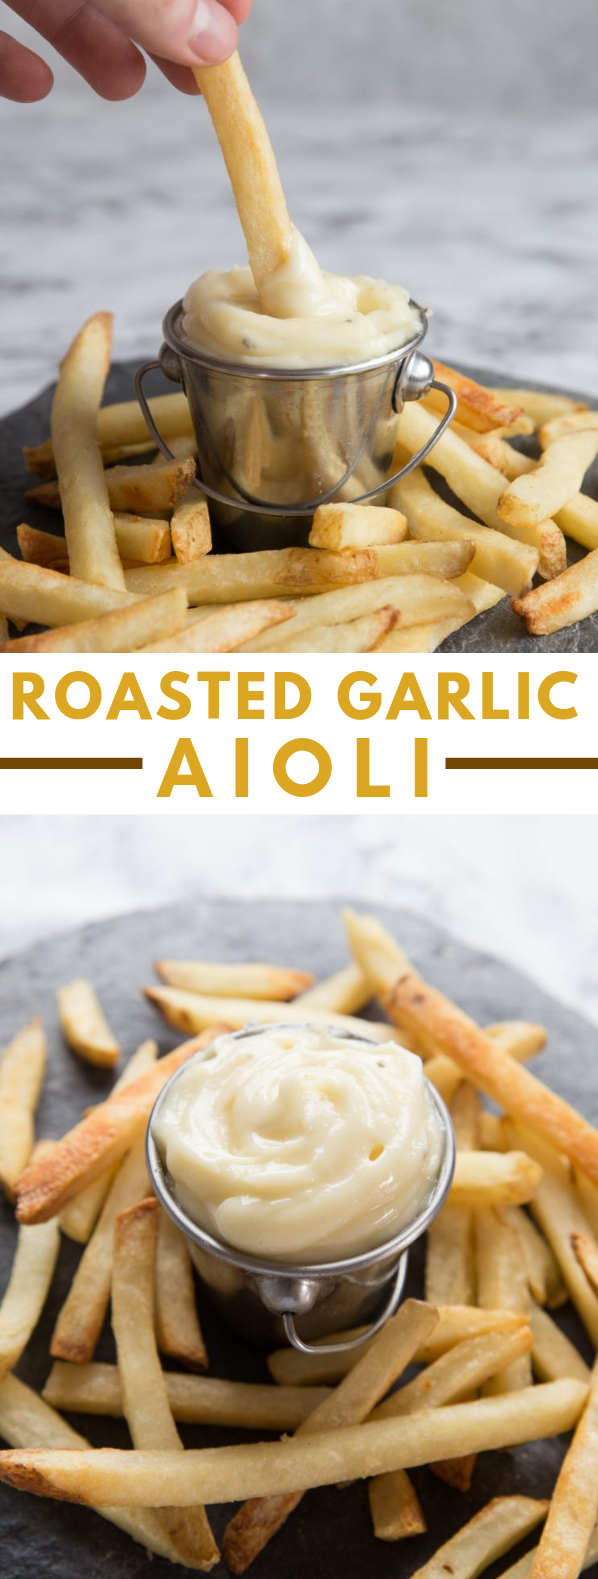 Roasted Garlic Aioli #vegetarian #homemade